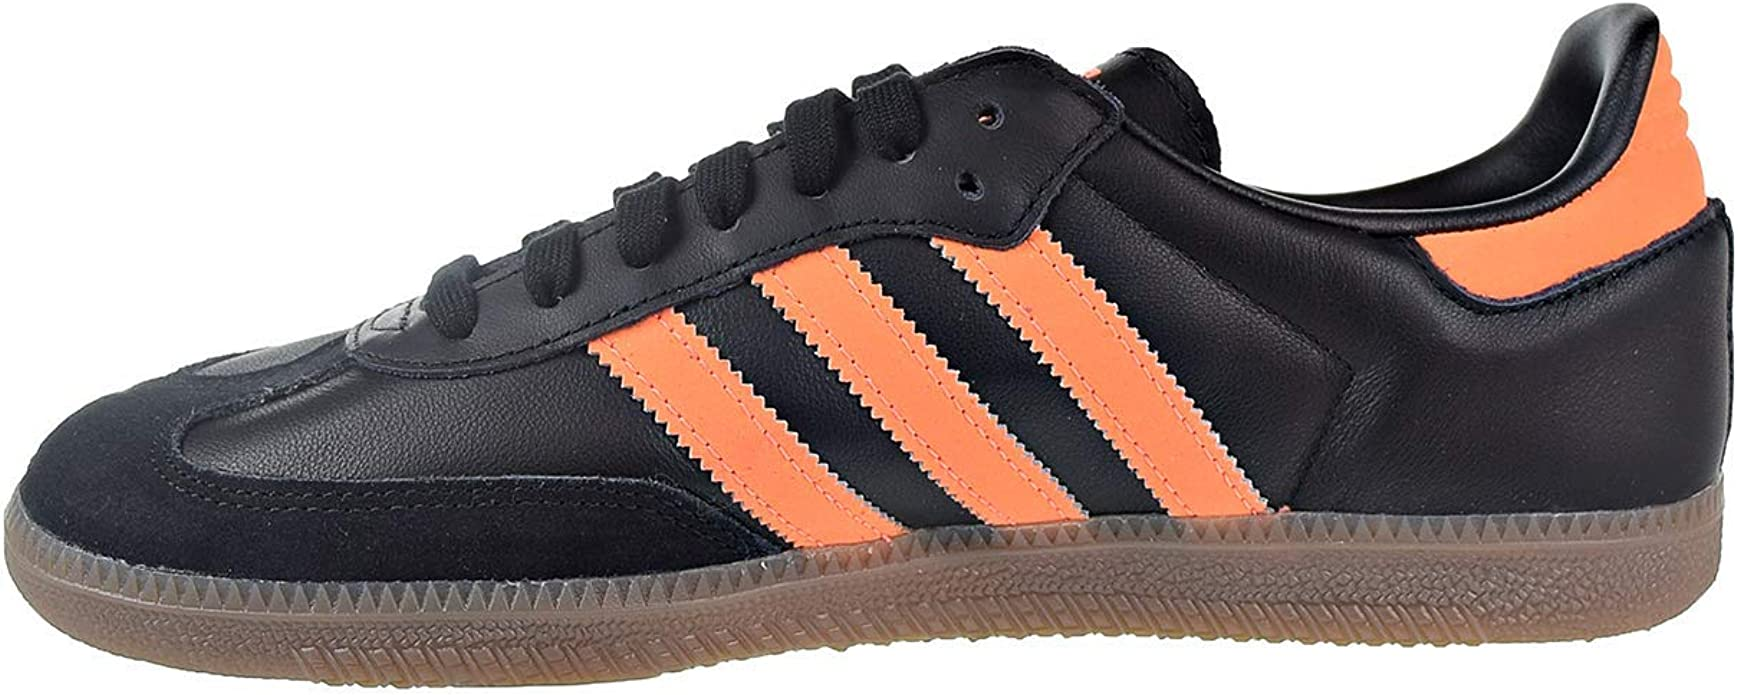 Amazon.com   adidas Mens Samba OG Shoes